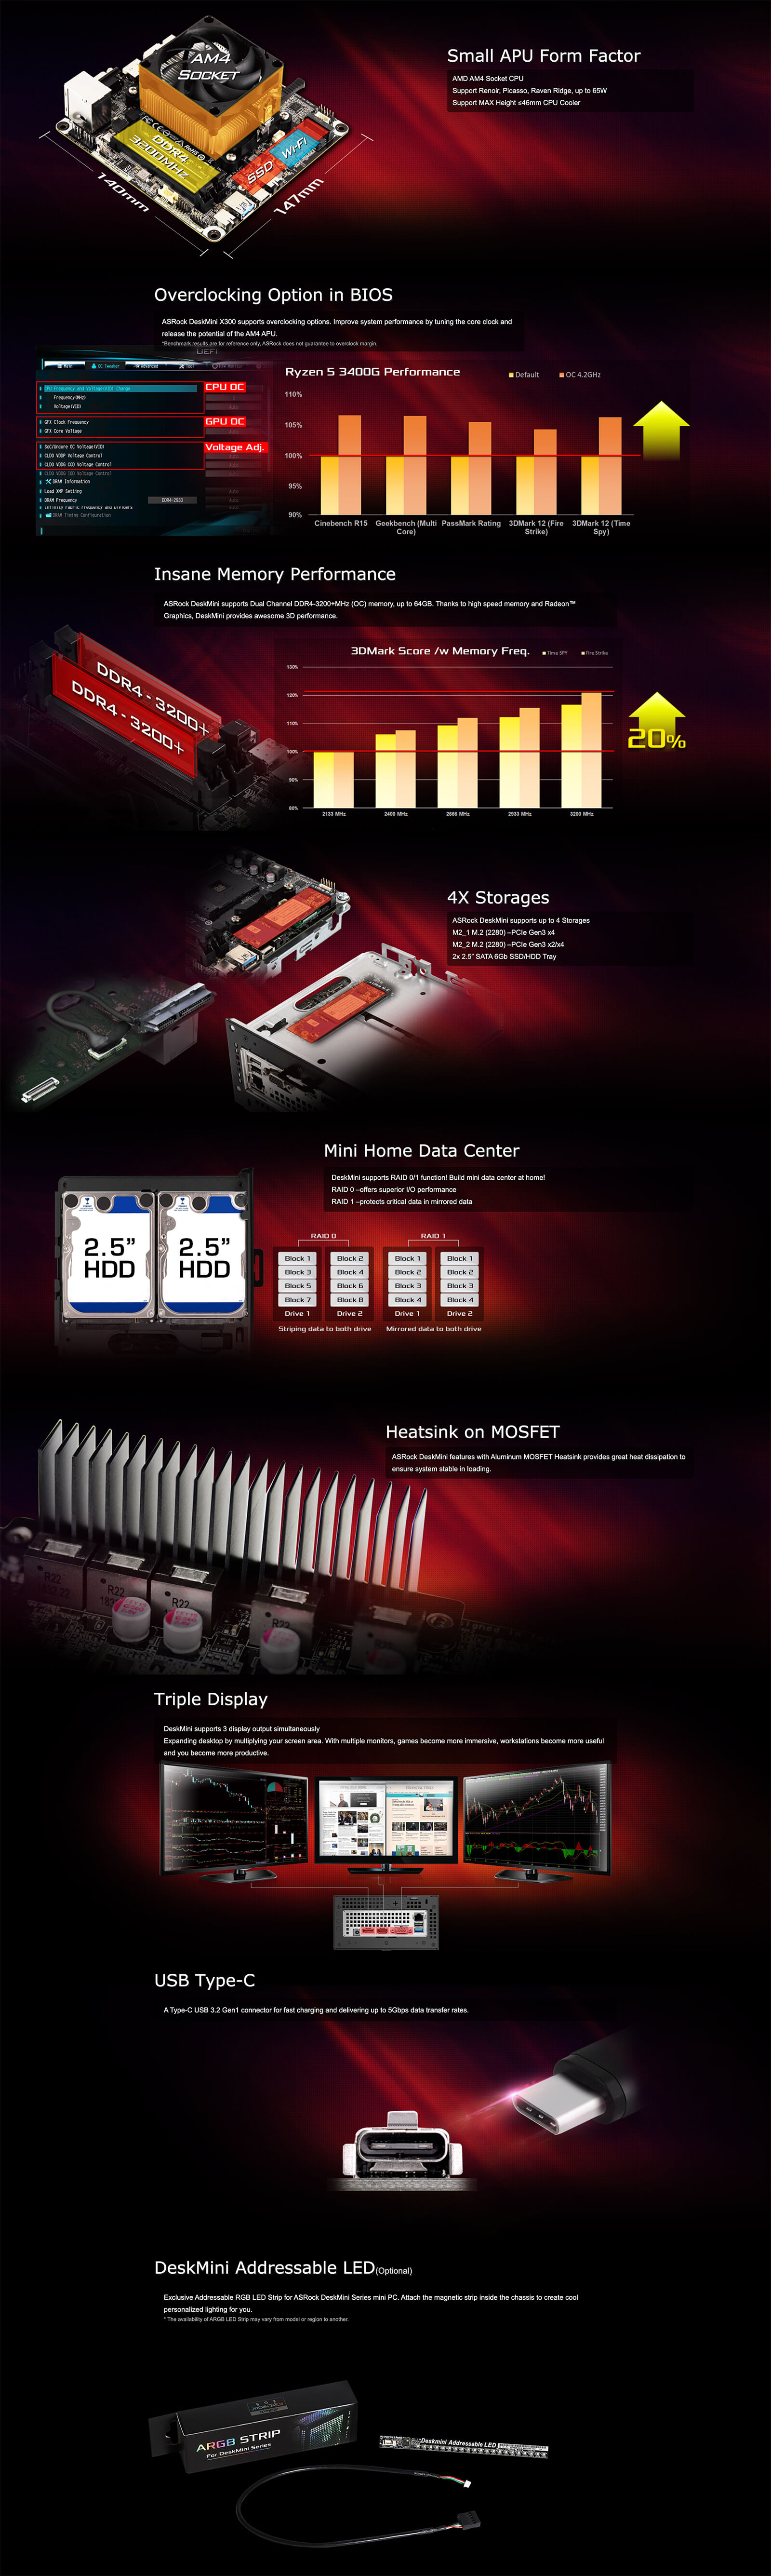 DeskMini X300 Series - (AM4 Socket CPU, 2 Slot RAM Up to 3200Mhz, Dual M.2 NVMe, Wifi, USB 3.2 Gen1 TypeC)